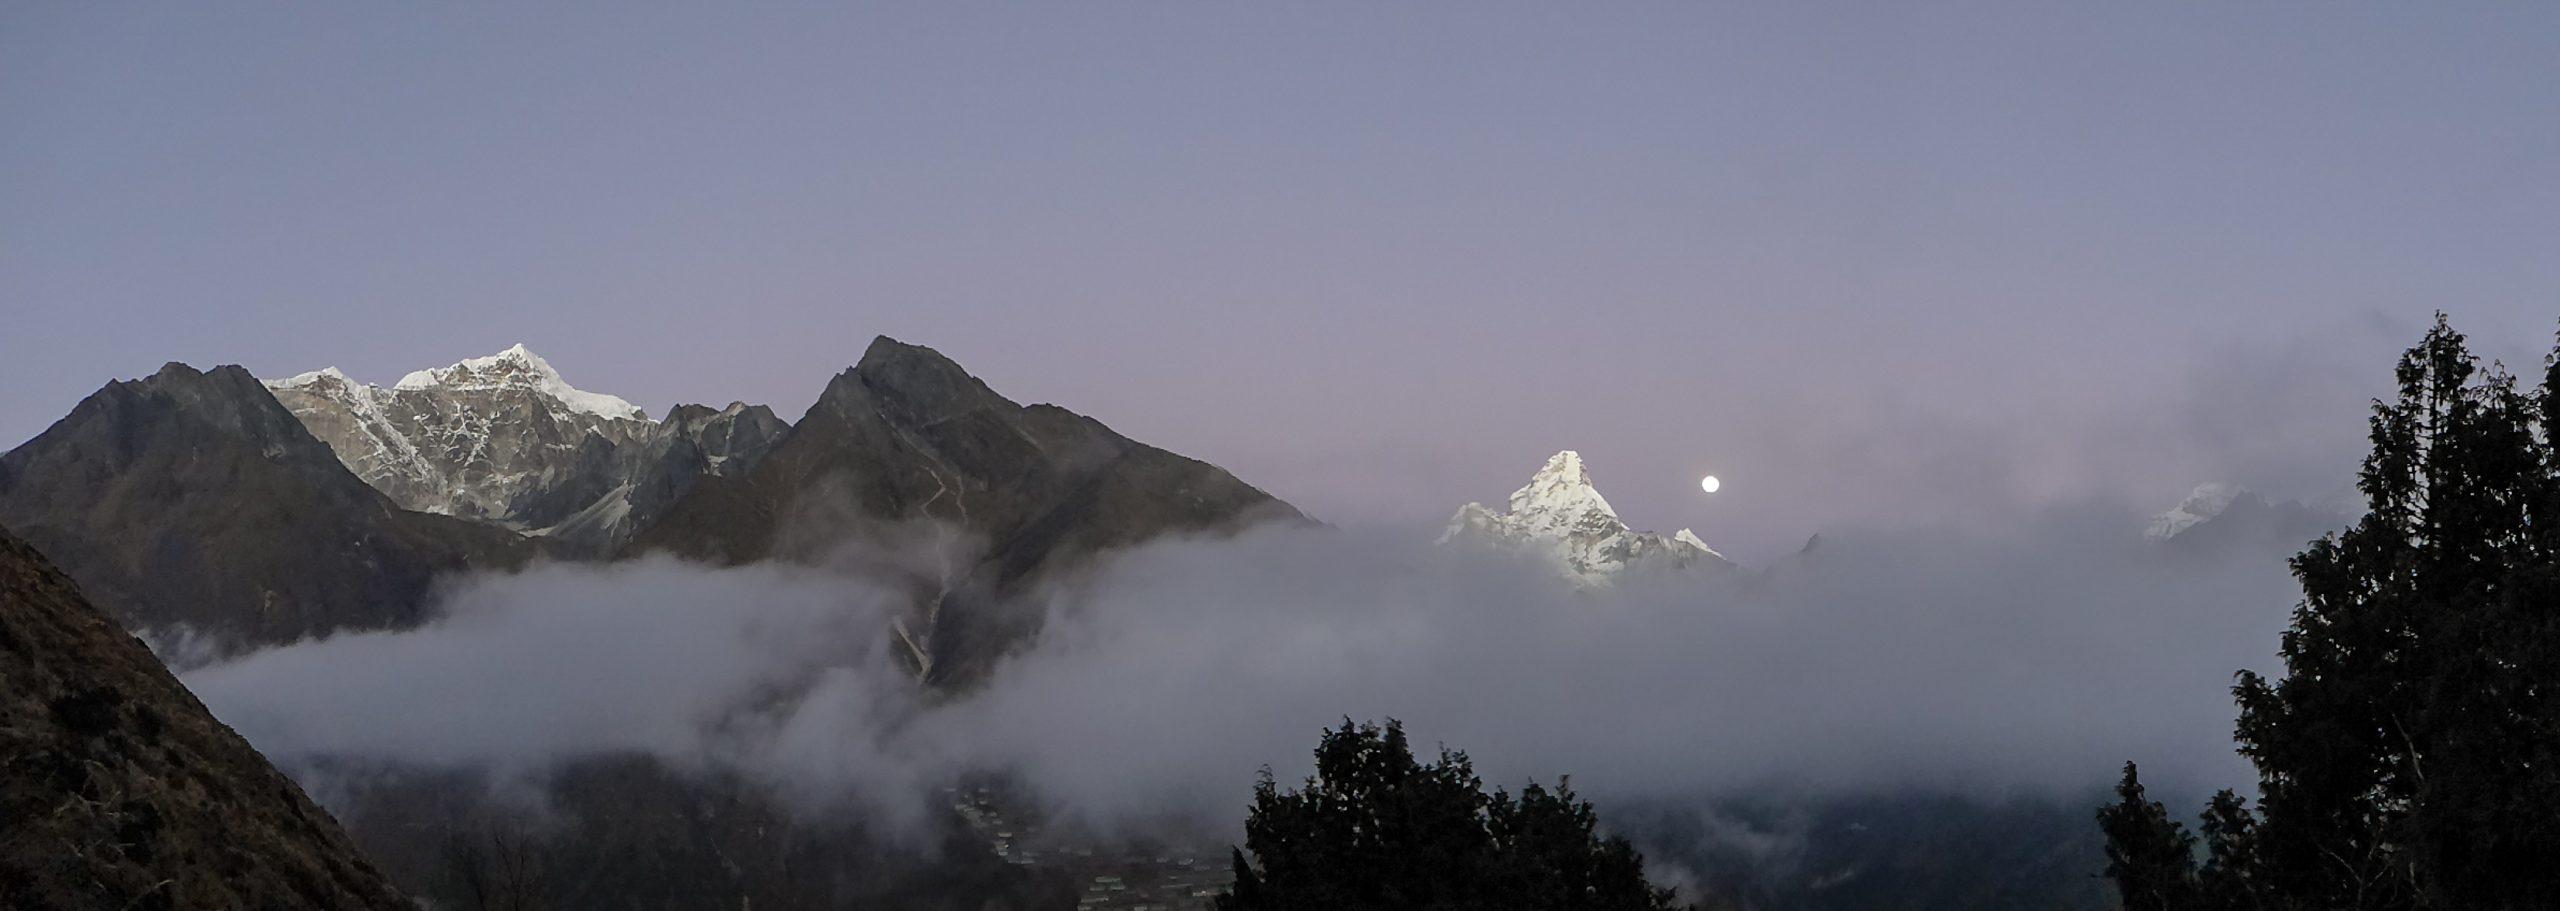 Stunning view in Nepal